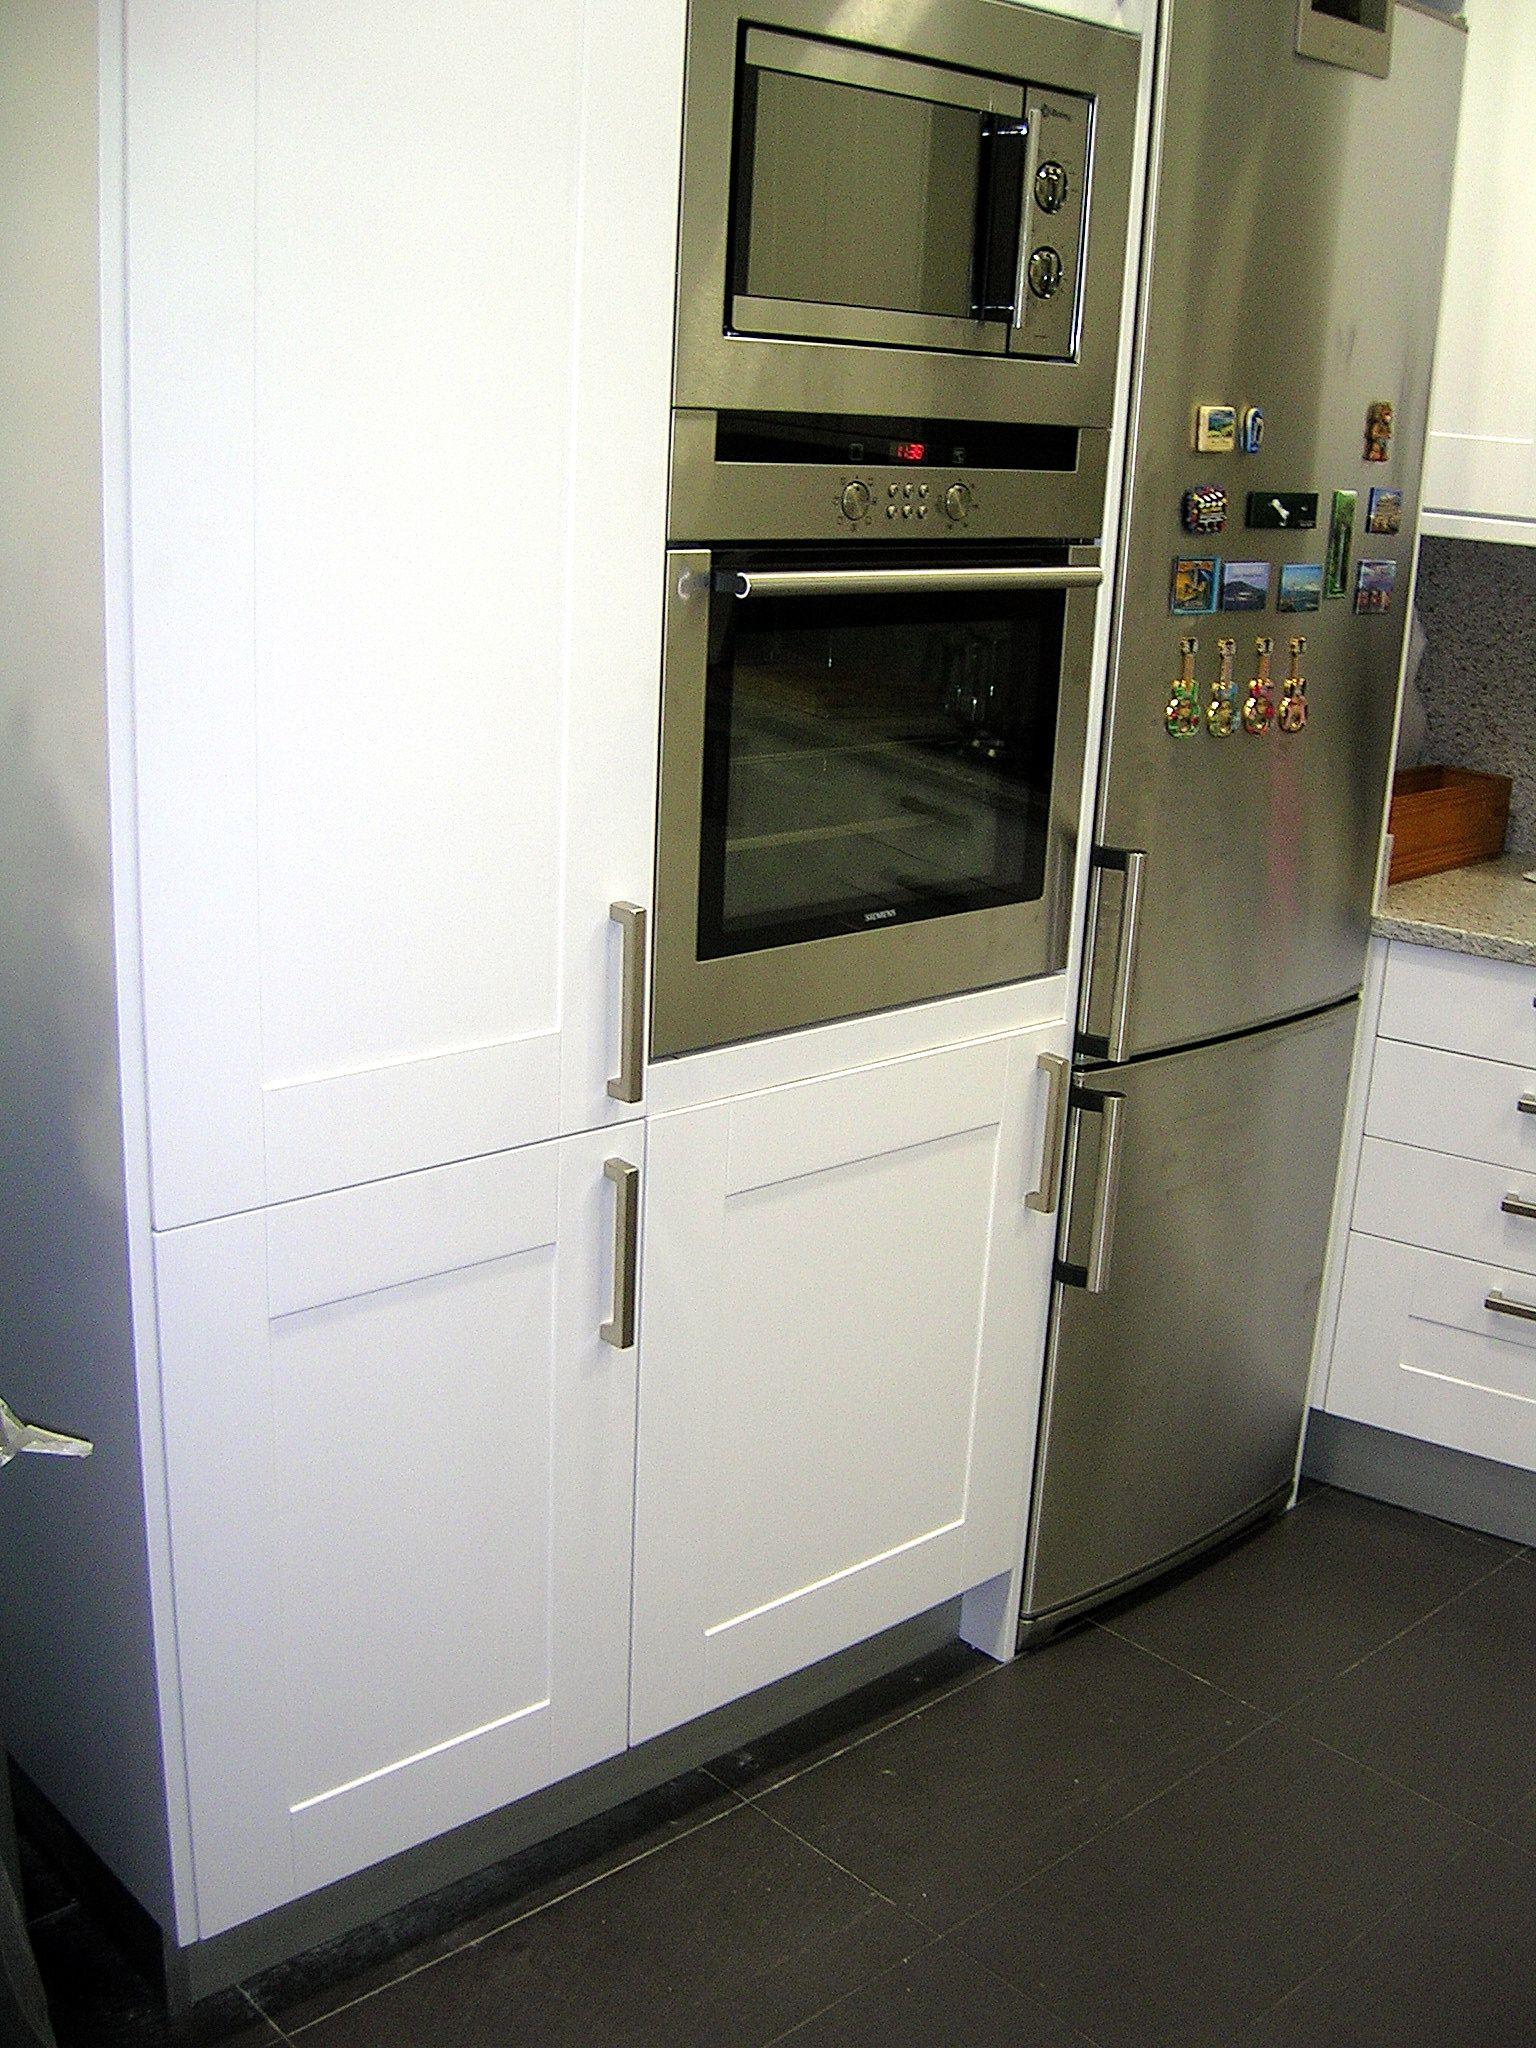 Columna lavadora horno micro proyectos reales - Columna horno y microondas ...